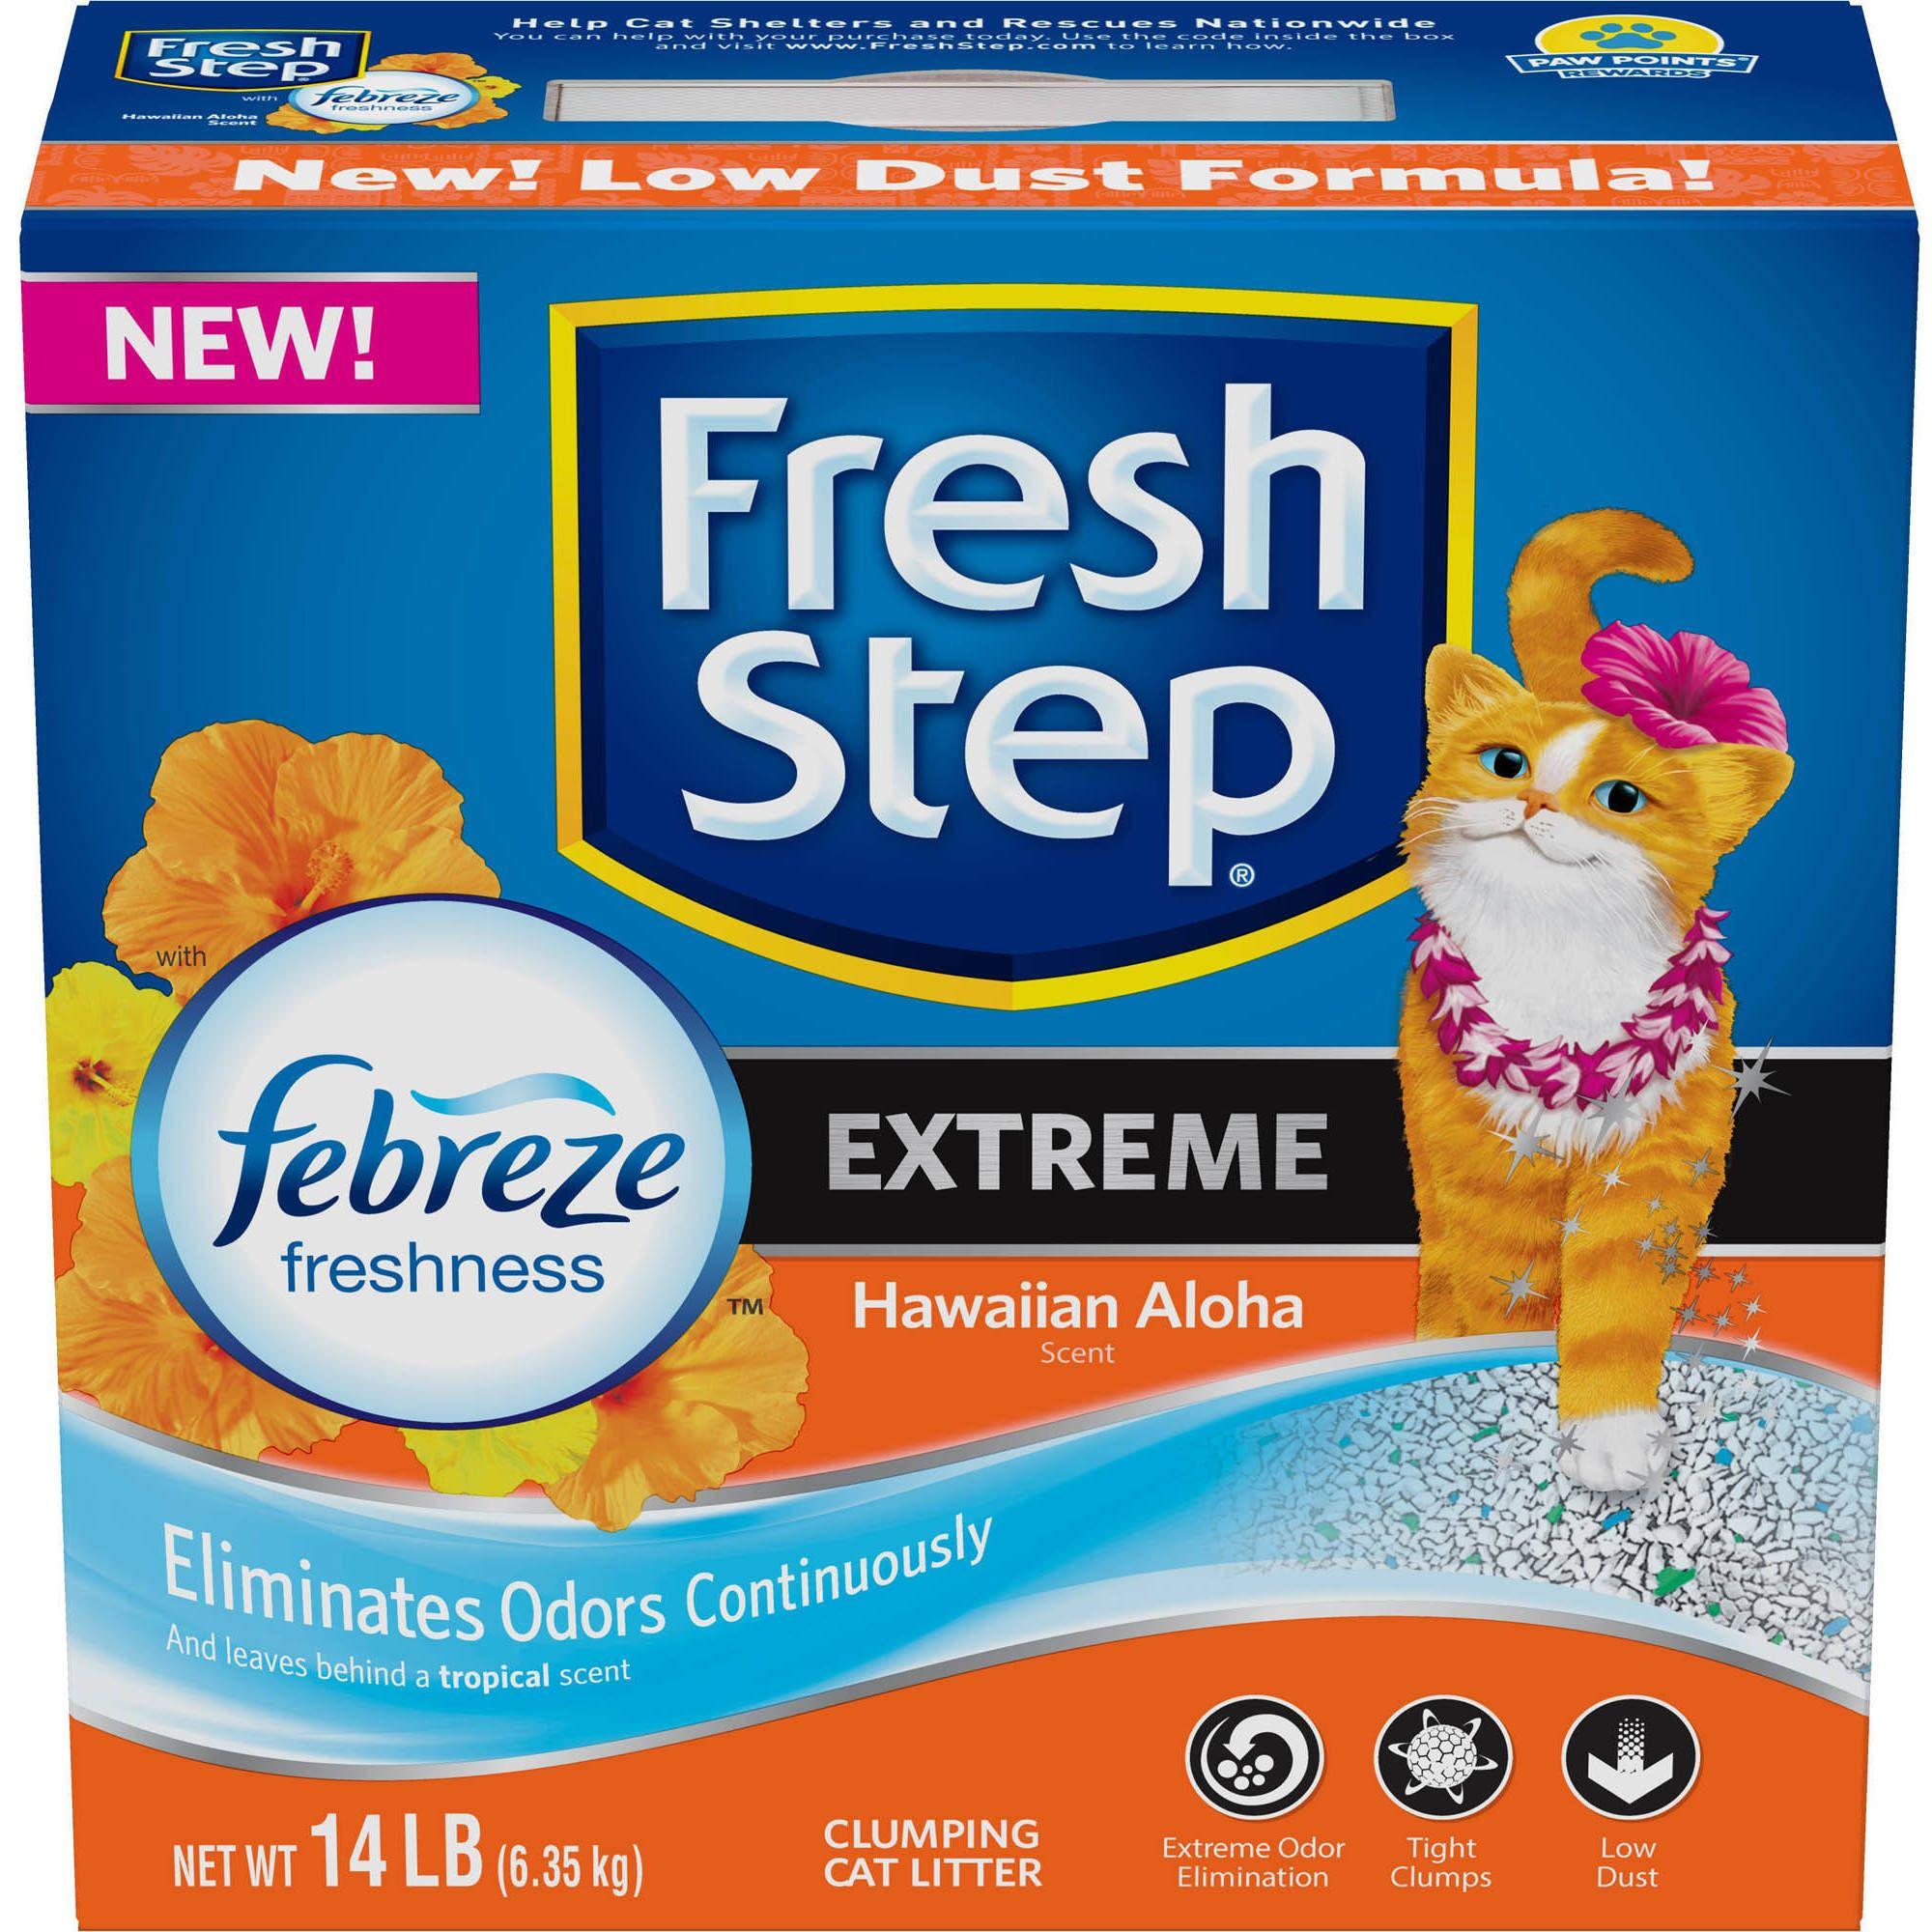 Fresh Step Extreme with Febreze Freshness Clumping Cat Litter, Hawaiian Aloha, 14 lbs - Walmart.com